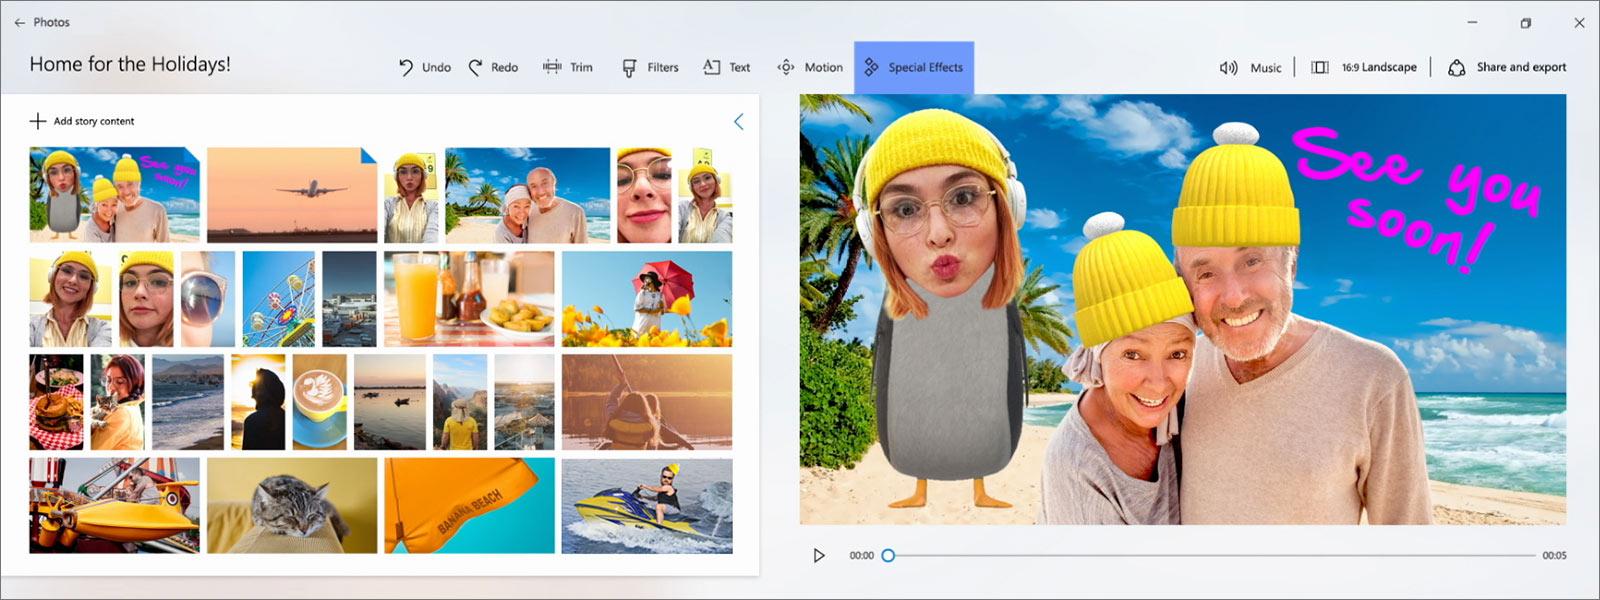 Aplikácia Fotografie systému Windows 10